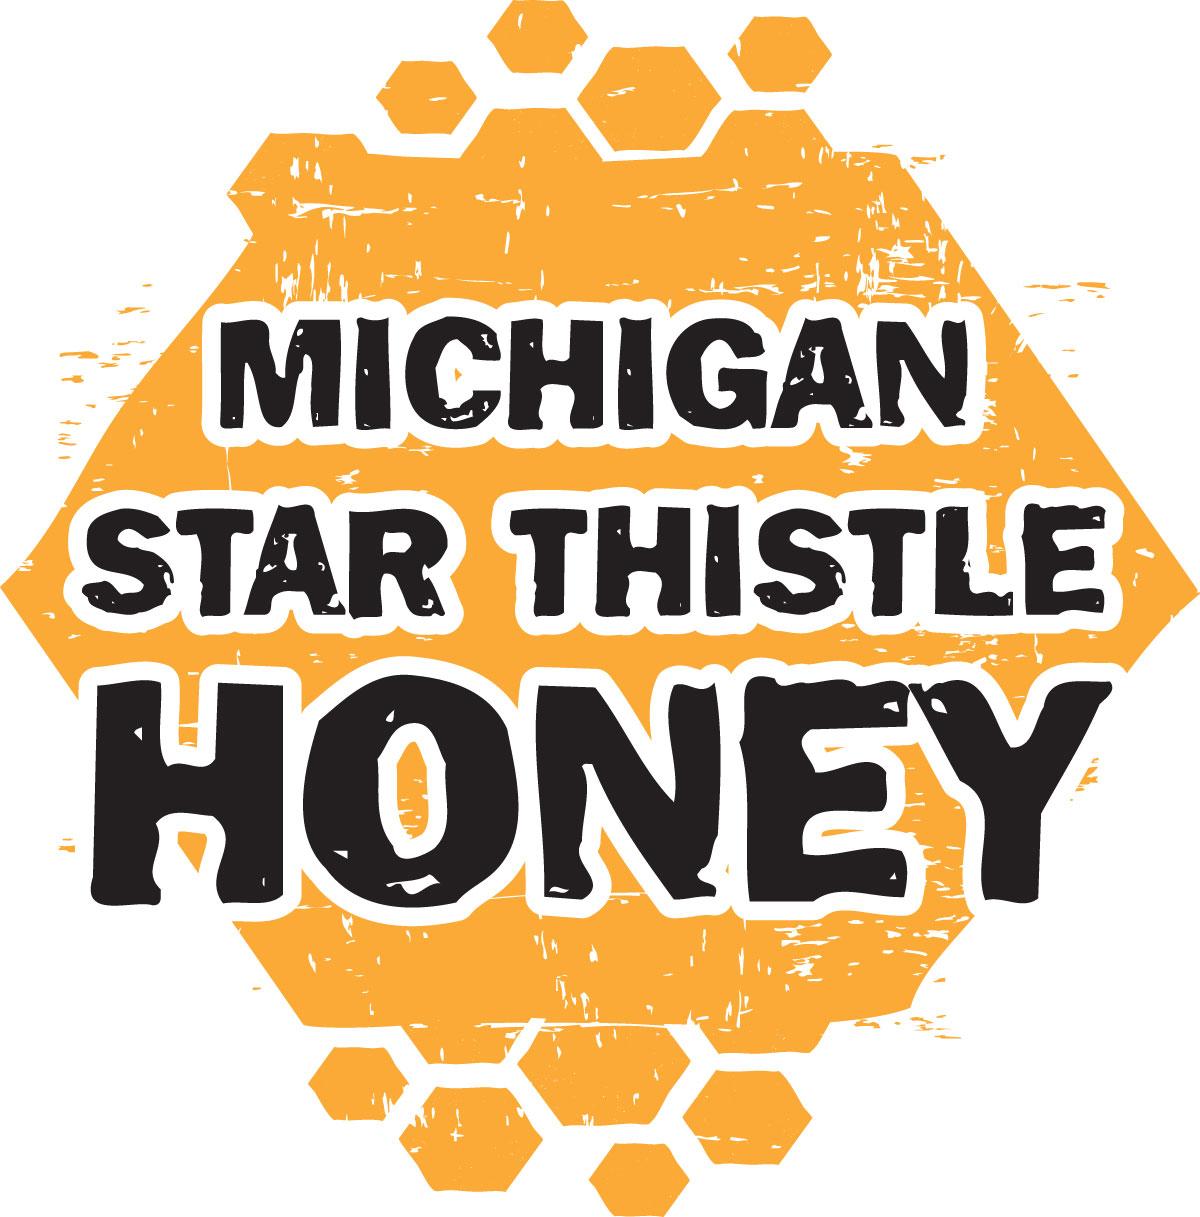 100% Pure & Raw Michigan Star Thistle Honey | 22 Oz